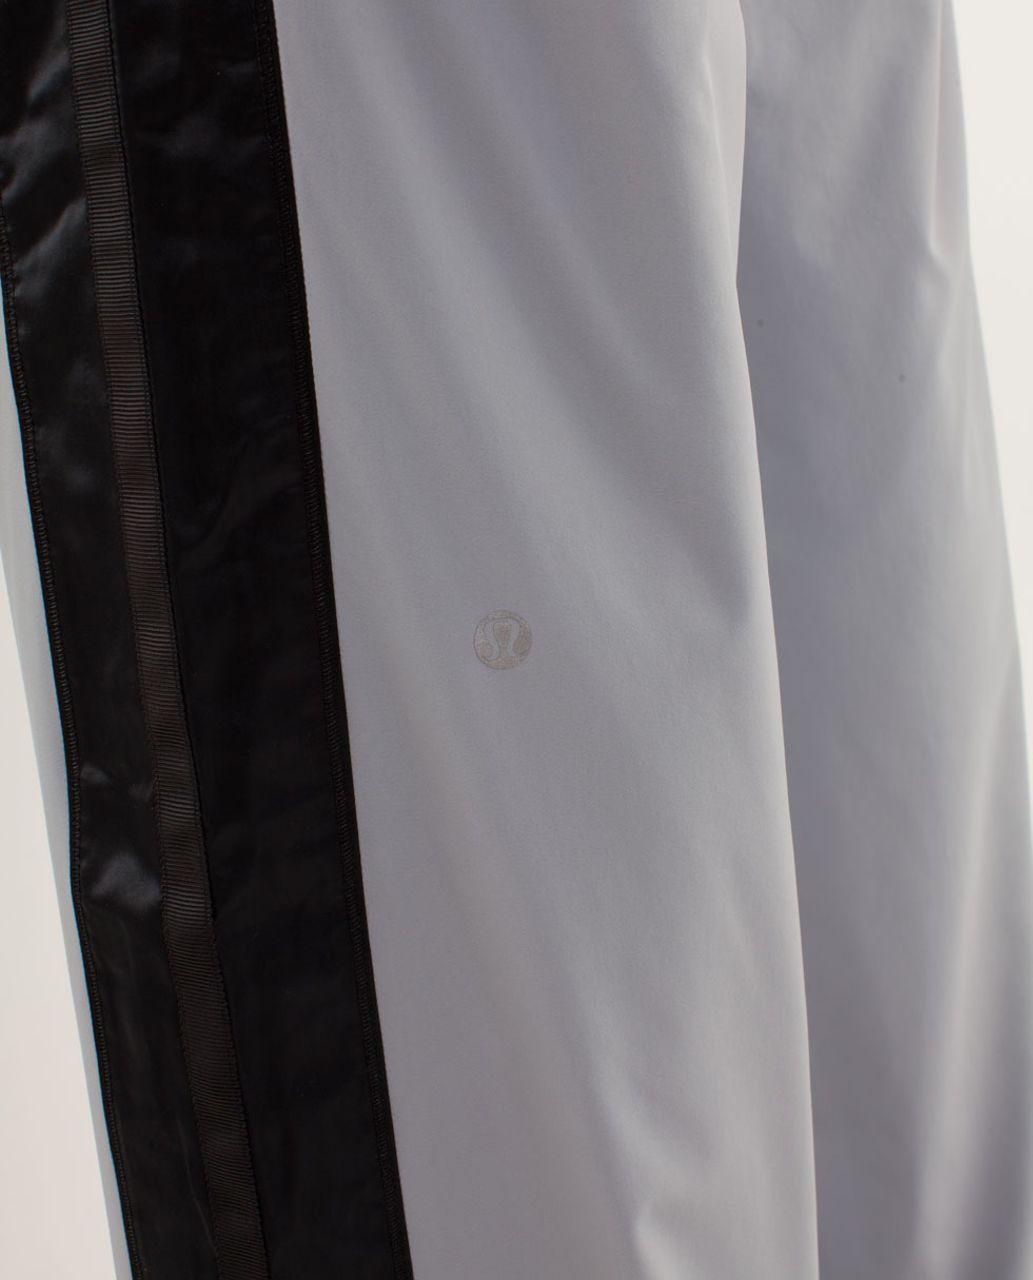 Lululemon Run:  Right Round Pant - Silver Slate